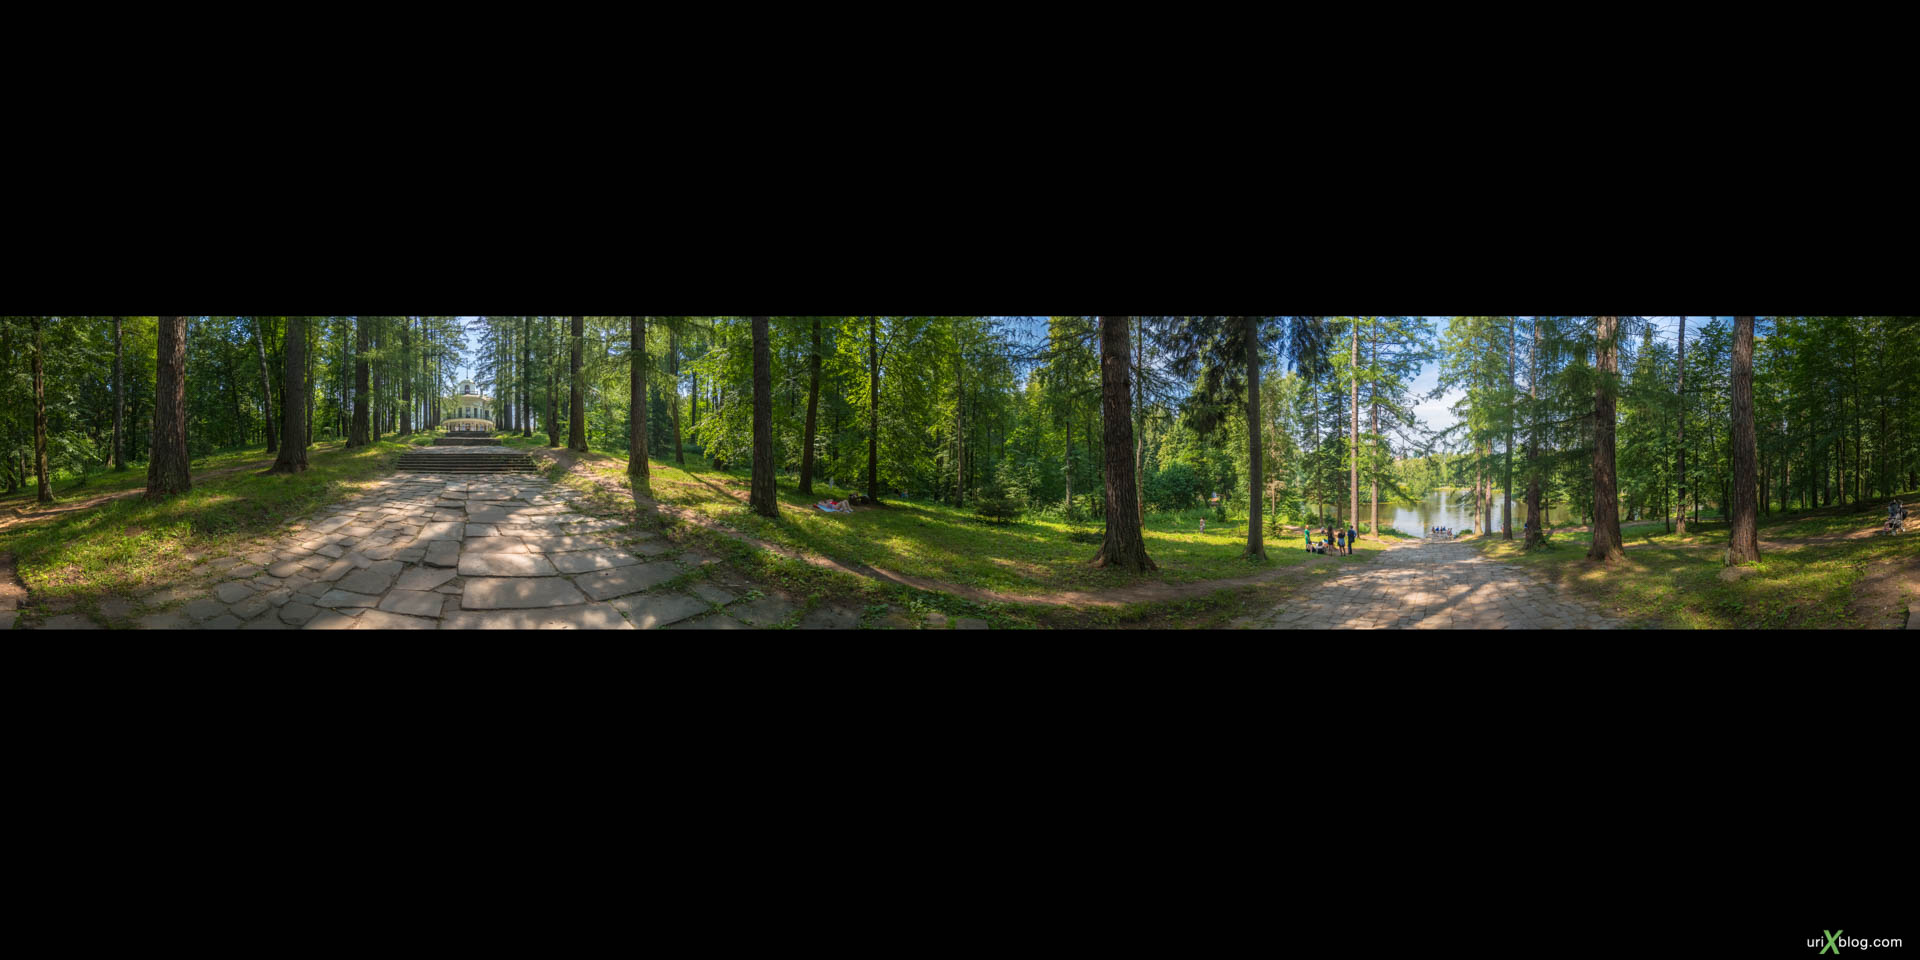 Барский пруд, Усадьба Середниково, панорама, 360, Россия